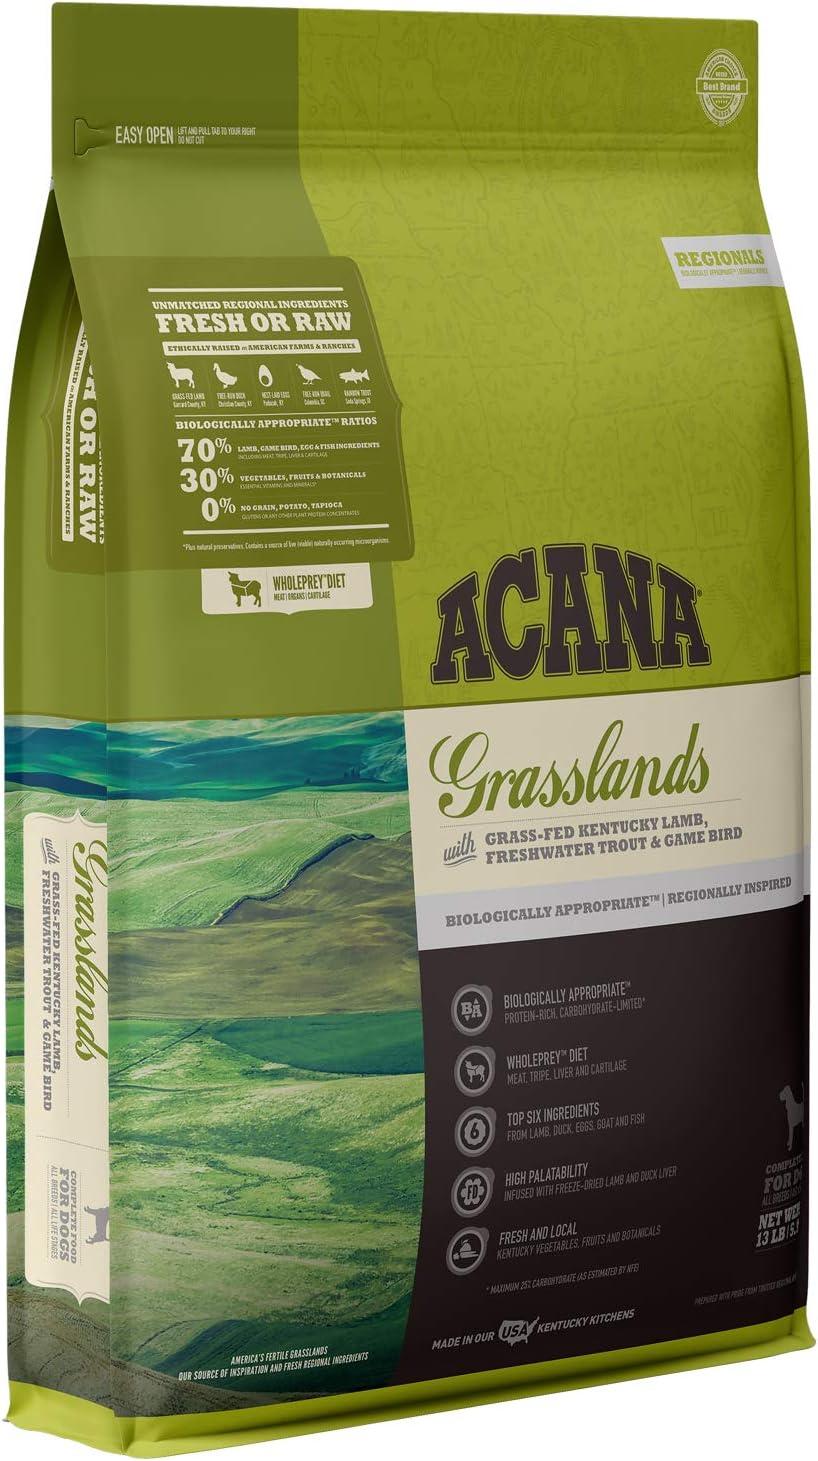 ACANA Regionals Grasslands Recipe, 13lb, Premium High-Protein, Grain-Free Dry Dog Food